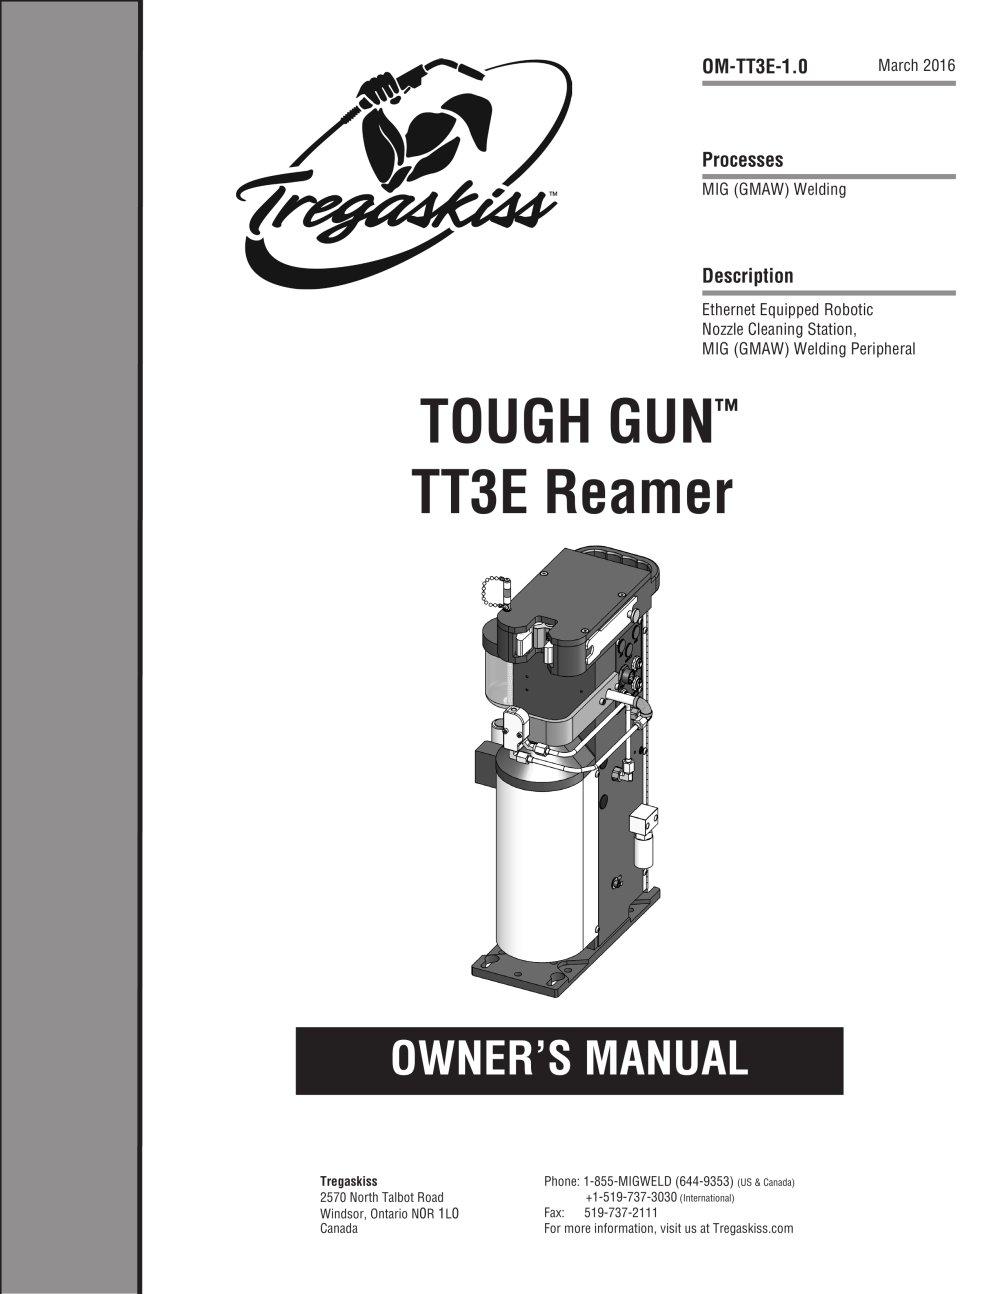 TOUGH GUN TT3E Reamer Owner's Manual - 1 / 36 Pages